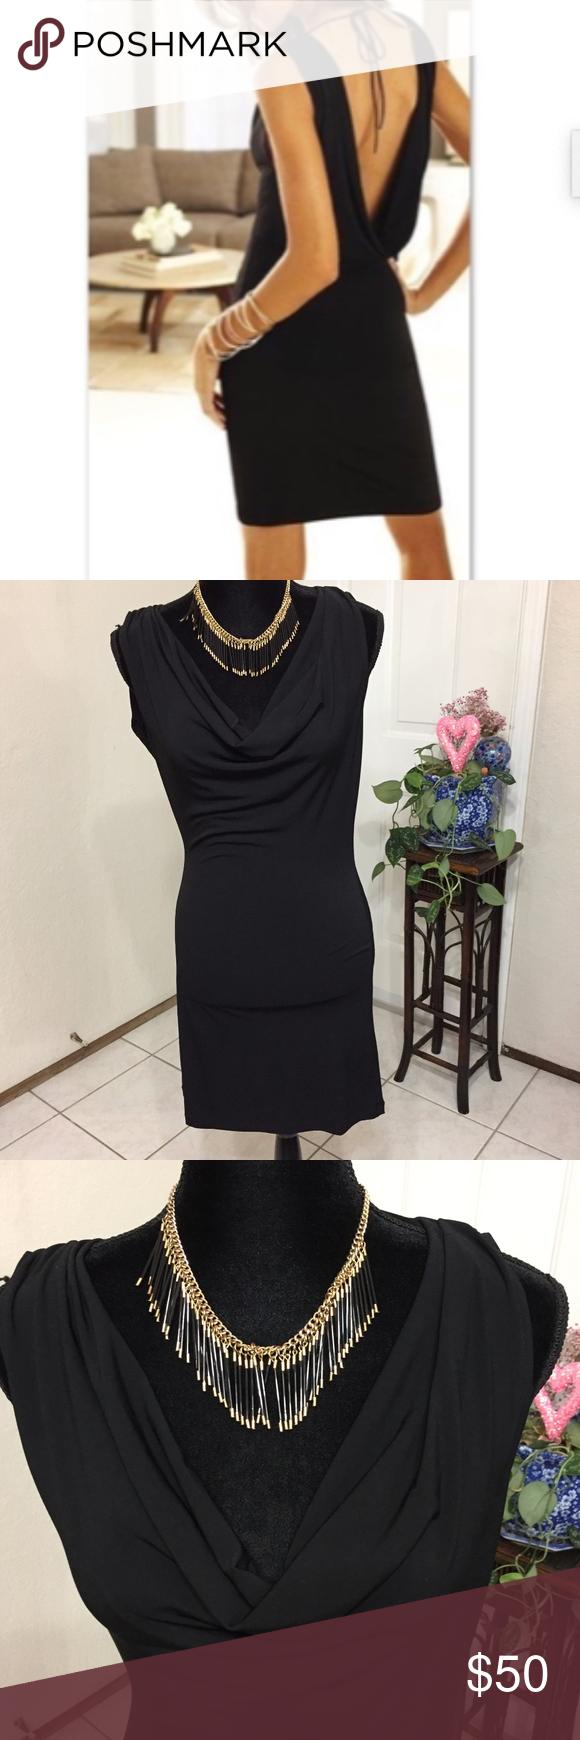 Victoria S Secret Cowl Neck And Open Back Dress Open Back Dresses Dress Backs Dresses [ 1740 x 580 Pixel ]